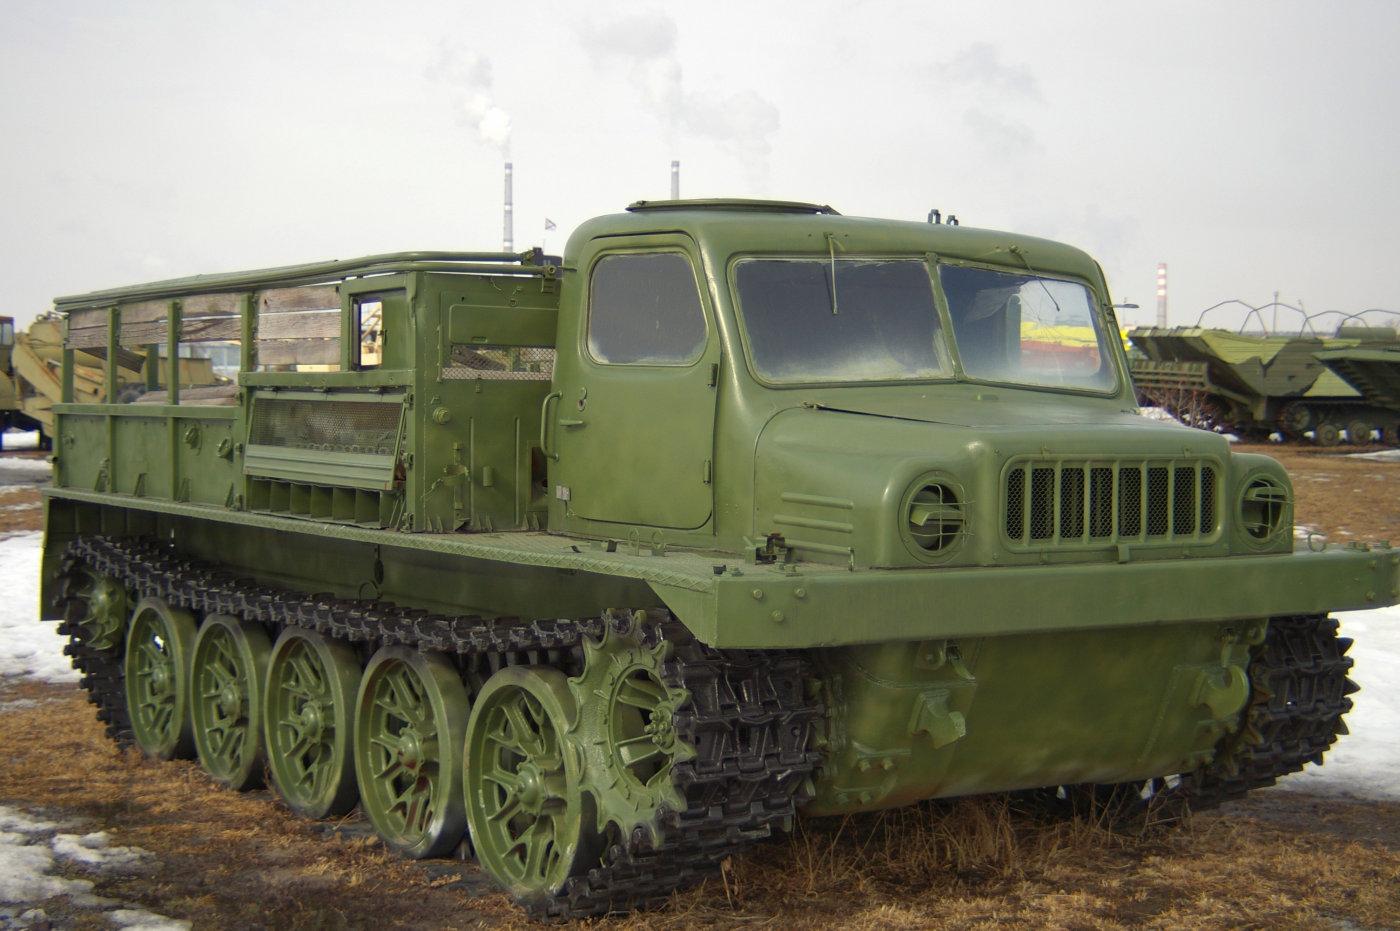 артиллерийский тягач АТС-59. г. Тольятти, технический музей им. К. Г. Сахарова